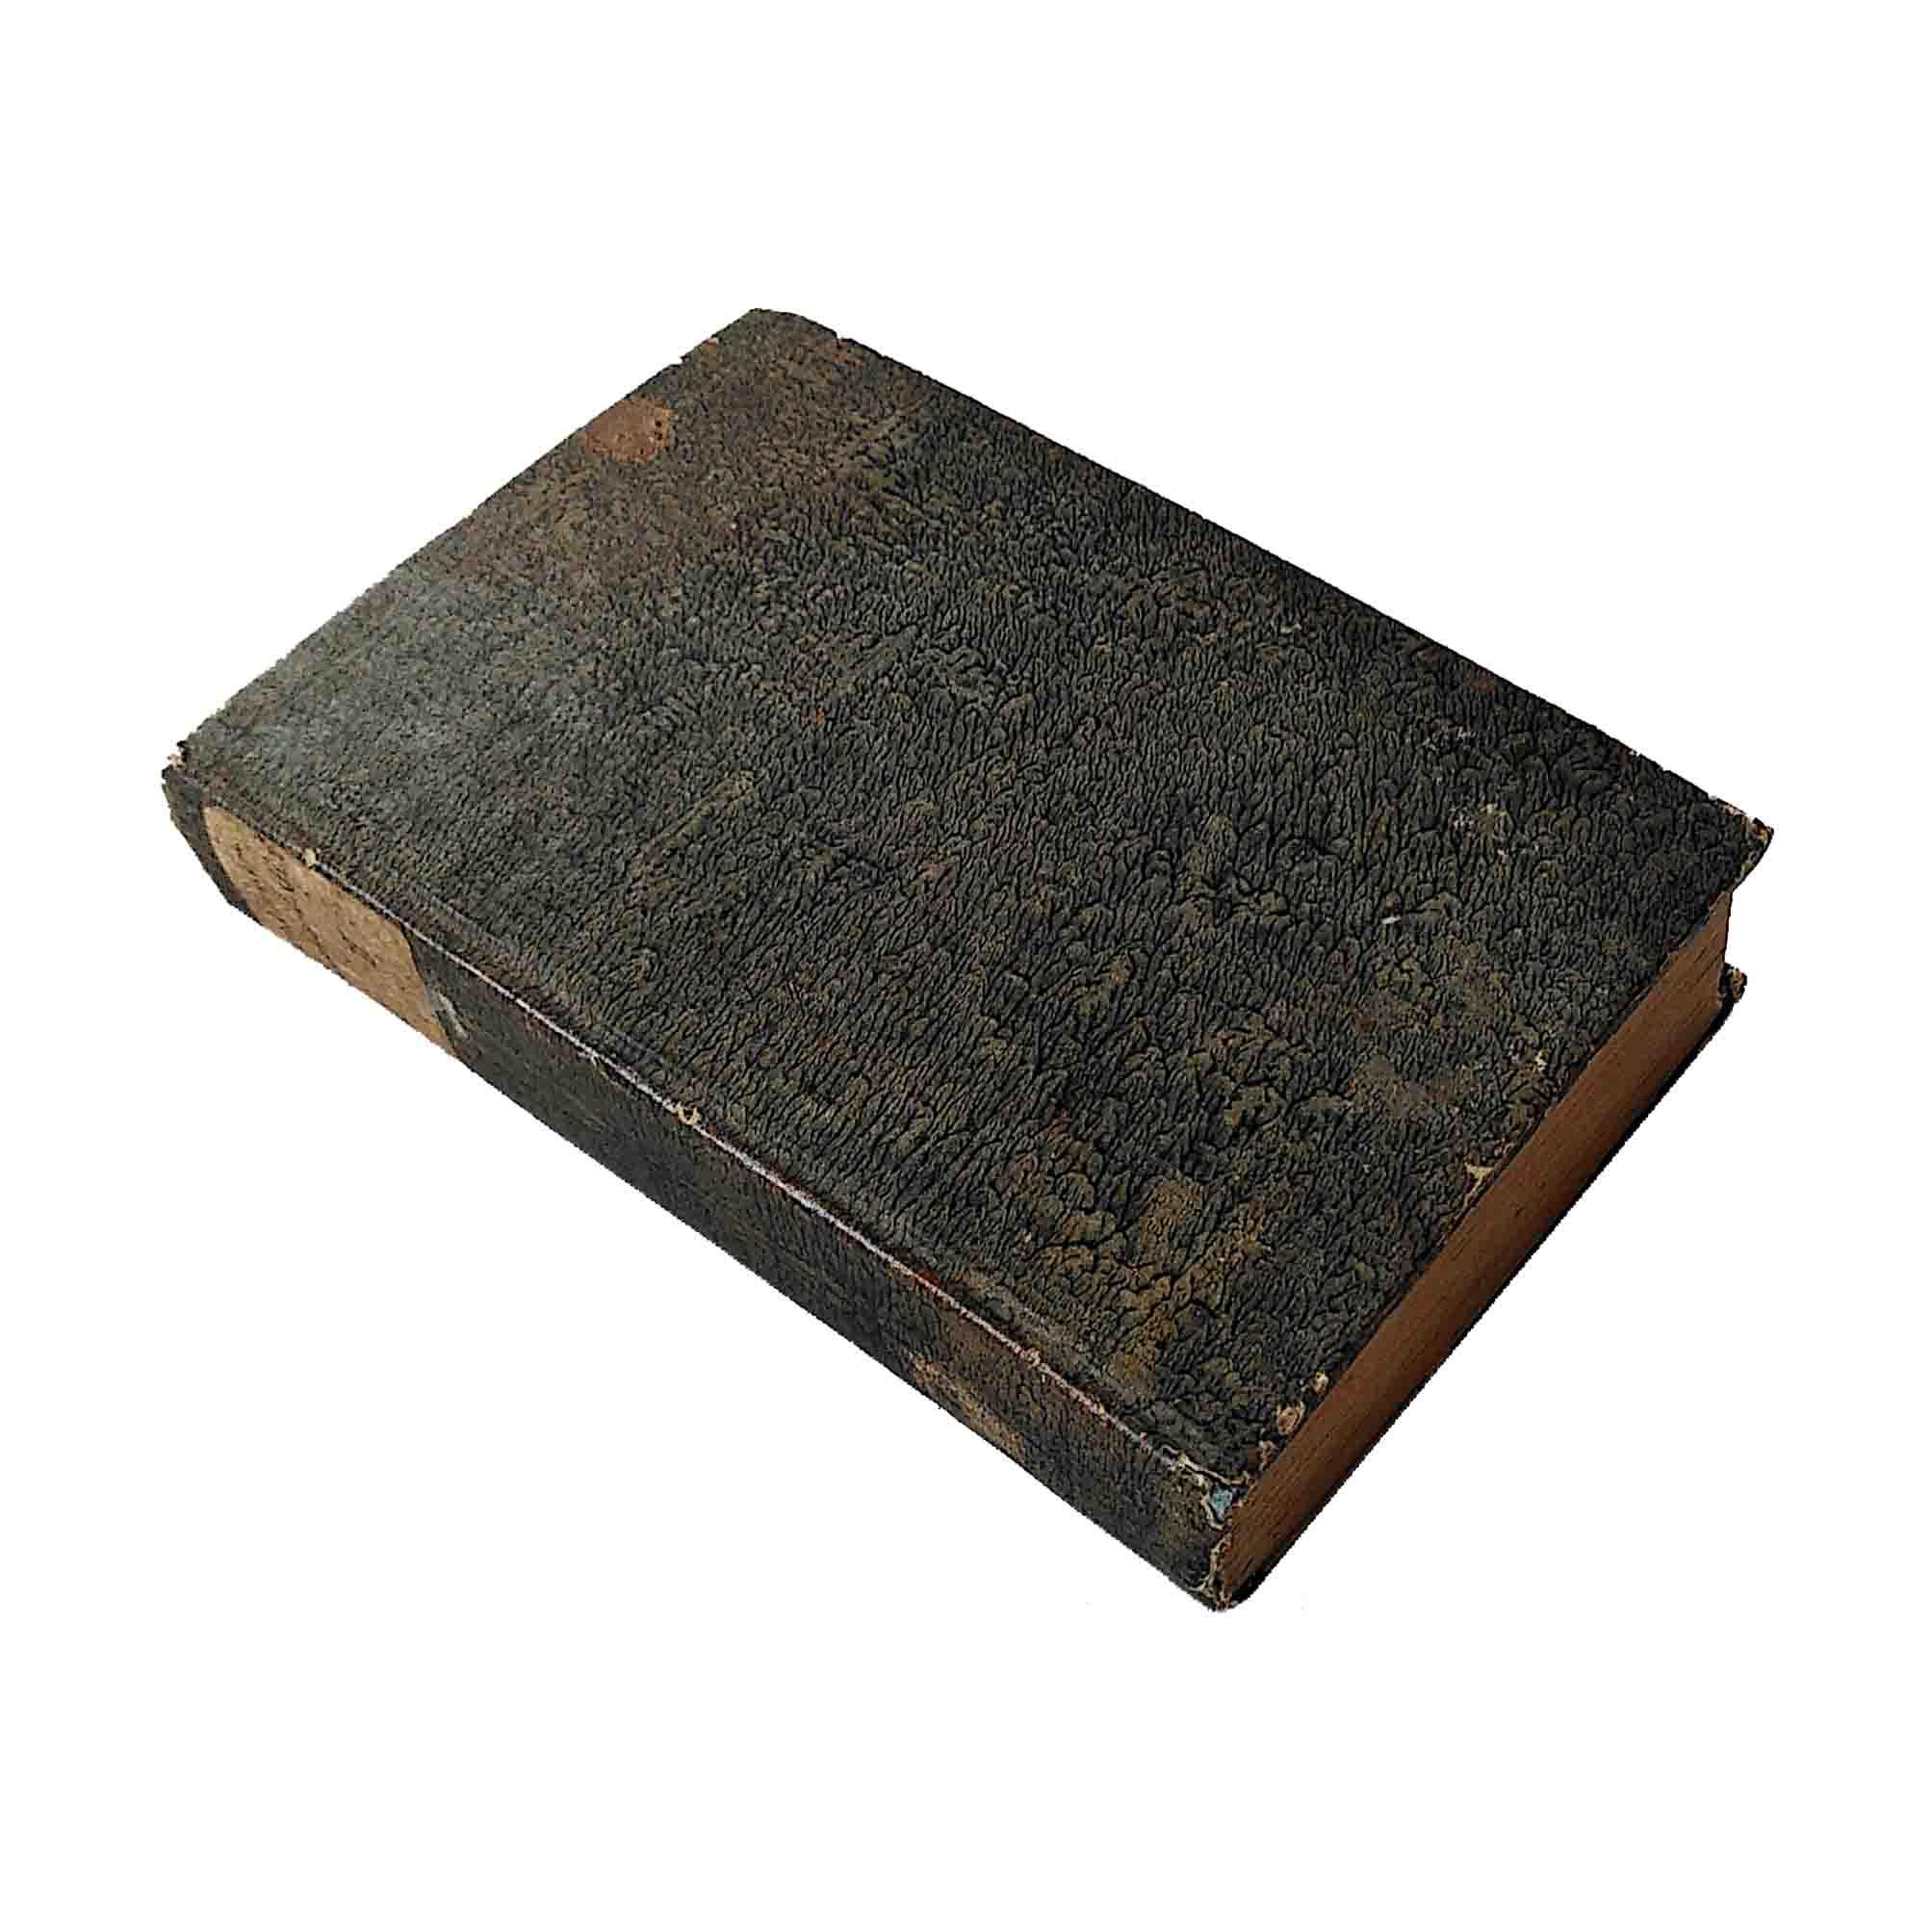 5839-Horwath-Statik-Mechanik-1809-1810-Einband-recto-Ruecken-frei-A-N.jpg